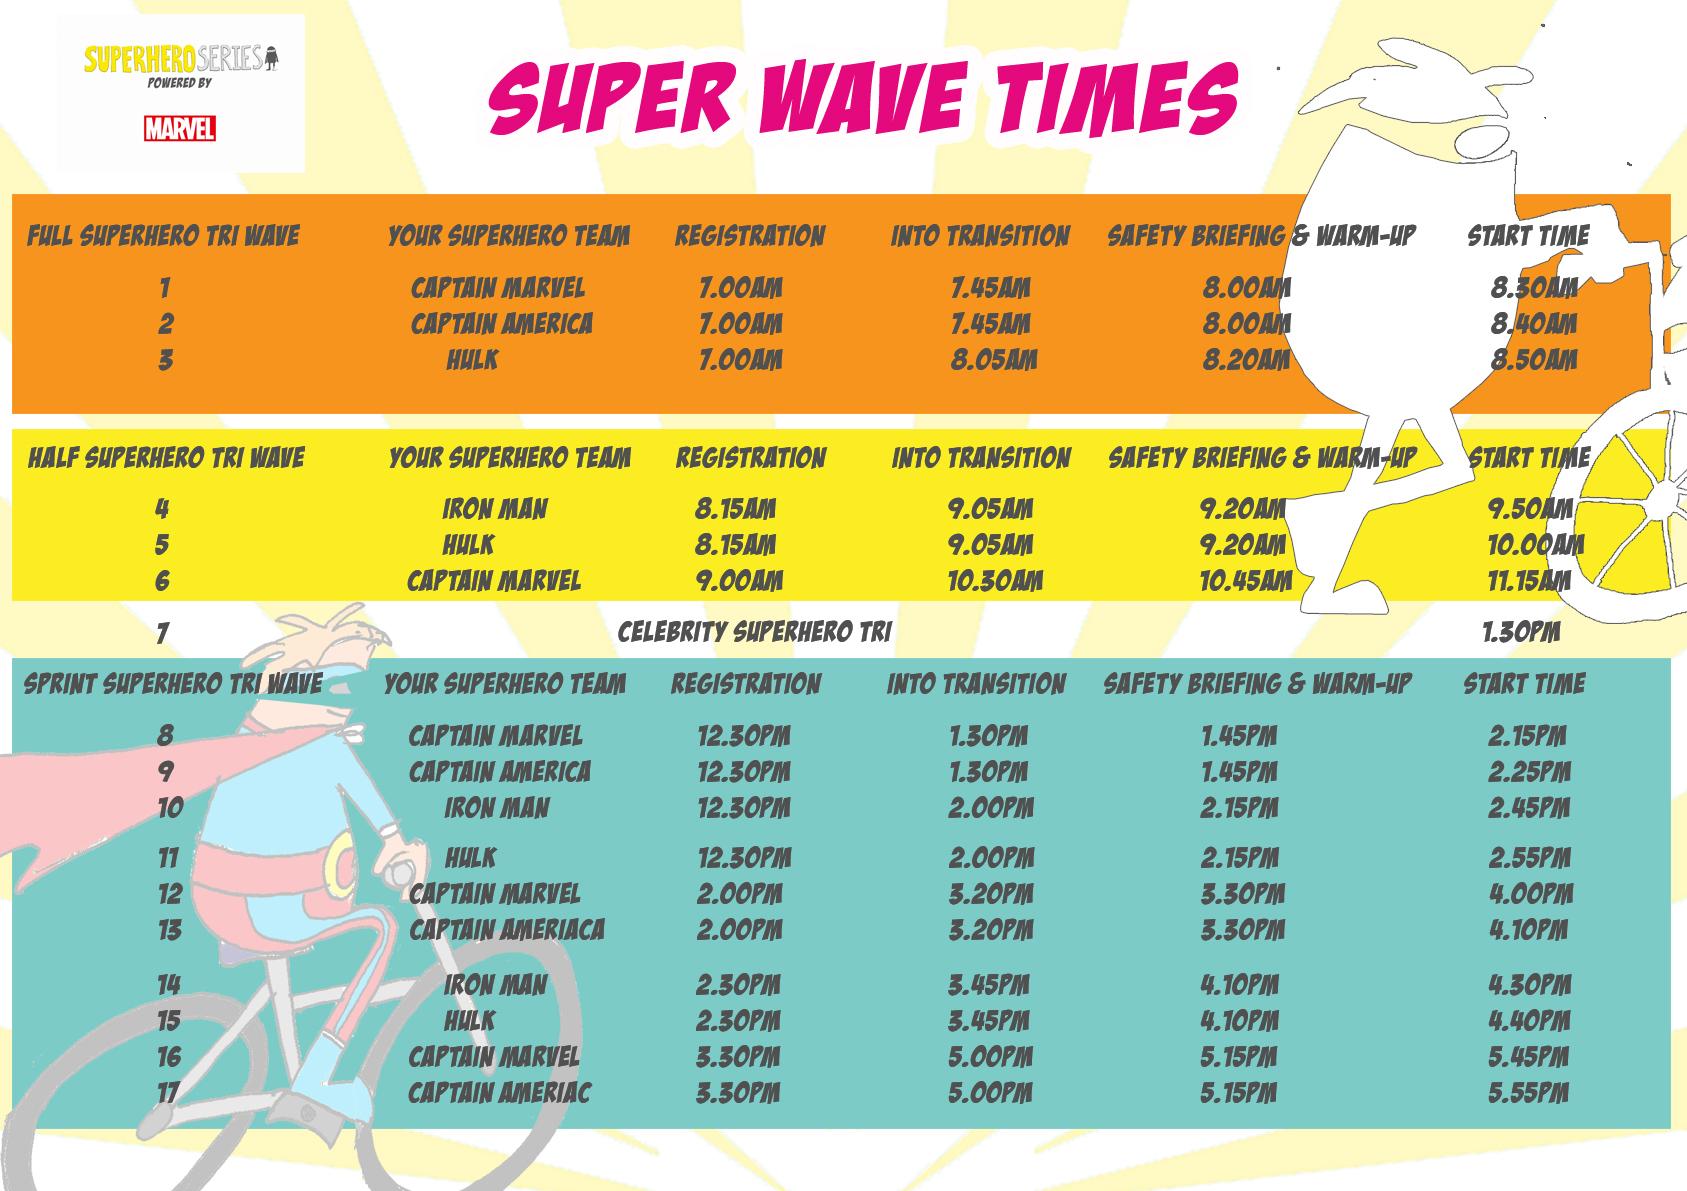 super wave times.jpg